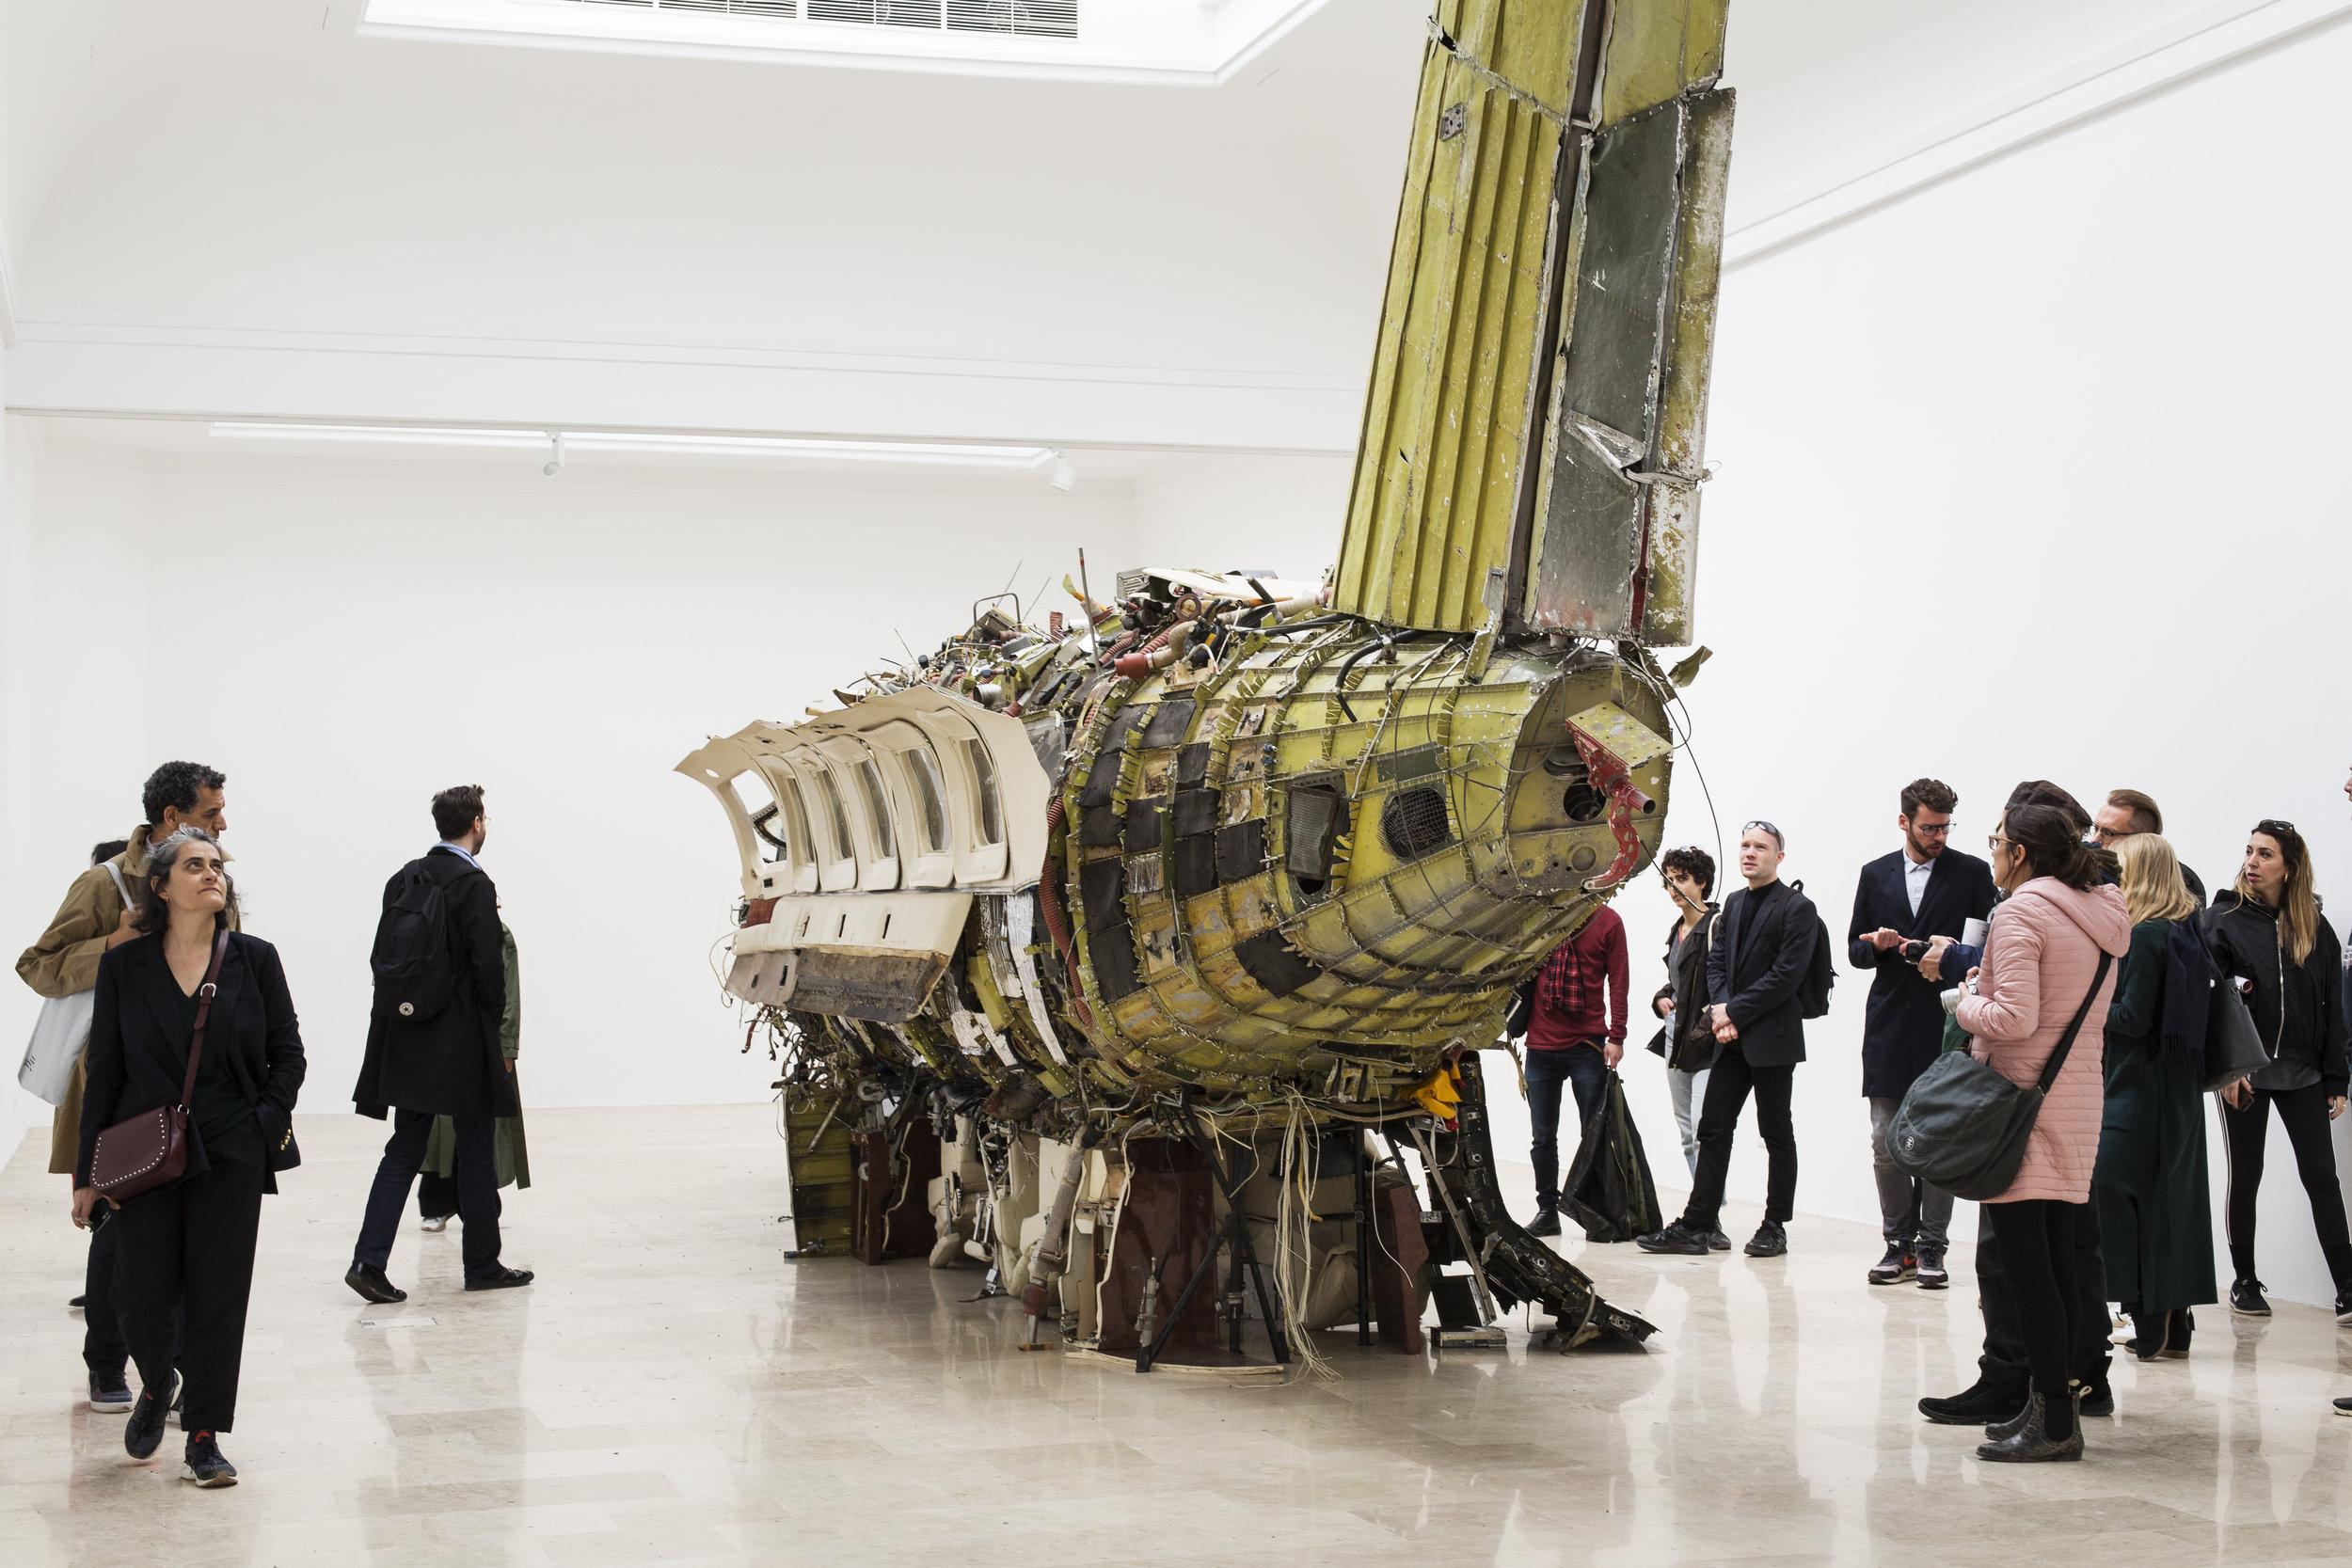 Flight  (2019) by Roman Stańczak. Installation view. Photo by Francesco Galli. Photo by Francesco Galli. Courtesy the artist, La Biennale di Venezia.